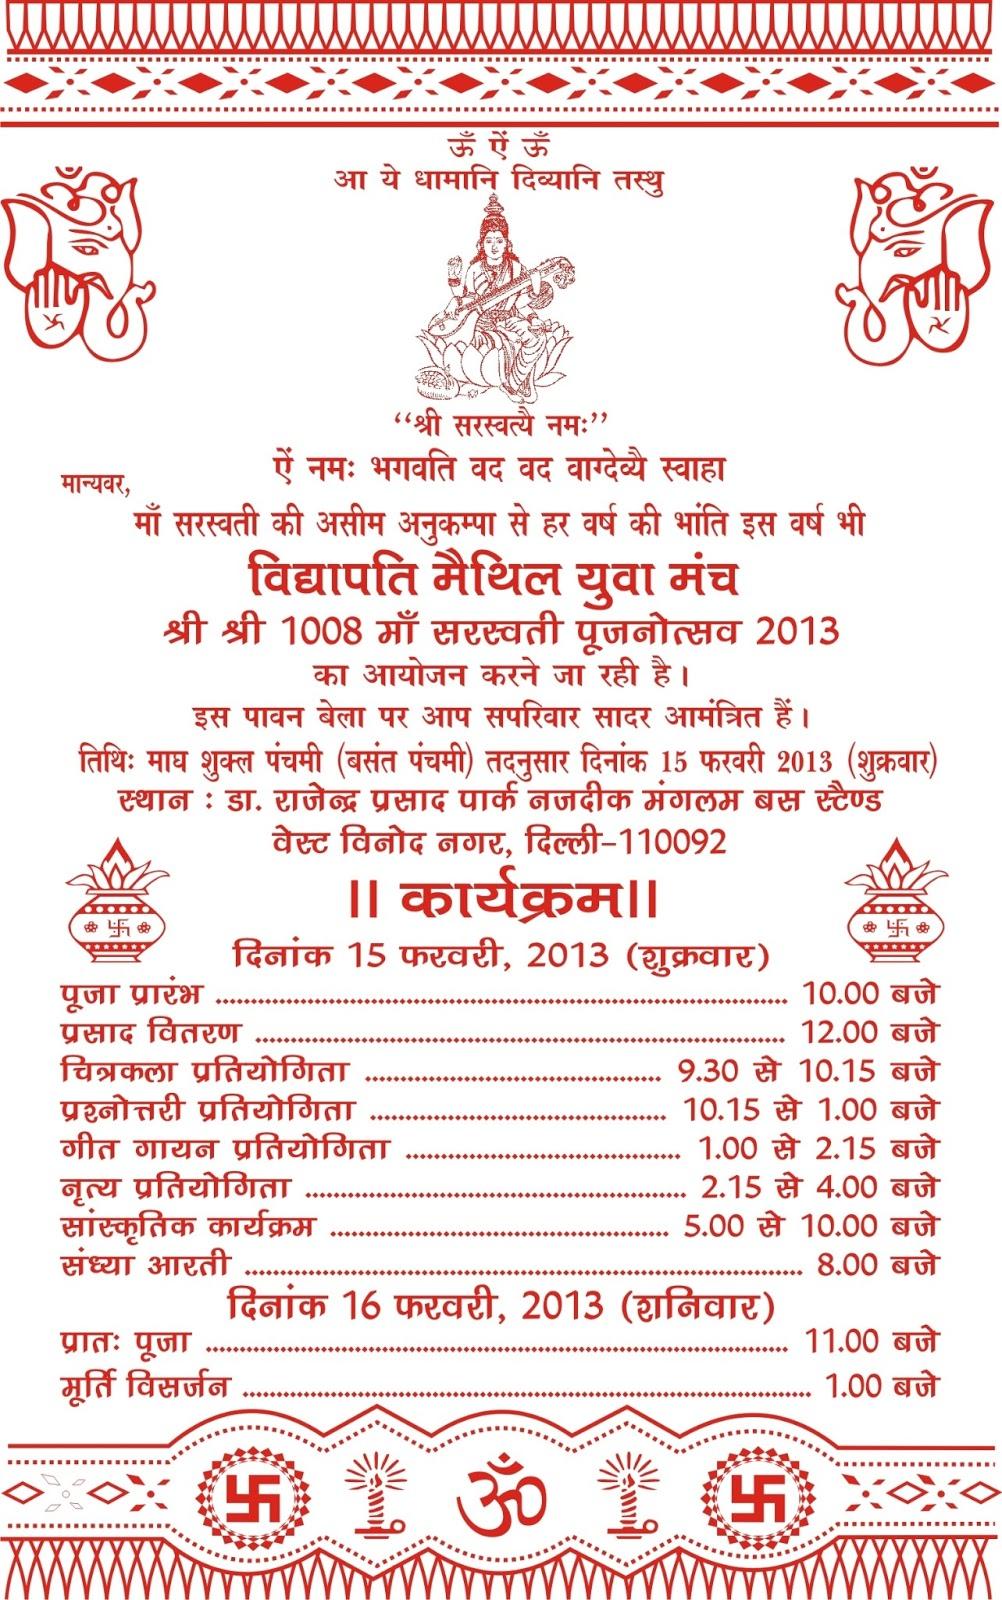 Invitation letter format for saraswati puja image collections durga puja invitation card format in hindi invitationjpg durga puja invitation card in hindi invitationjpg com stopboris Images